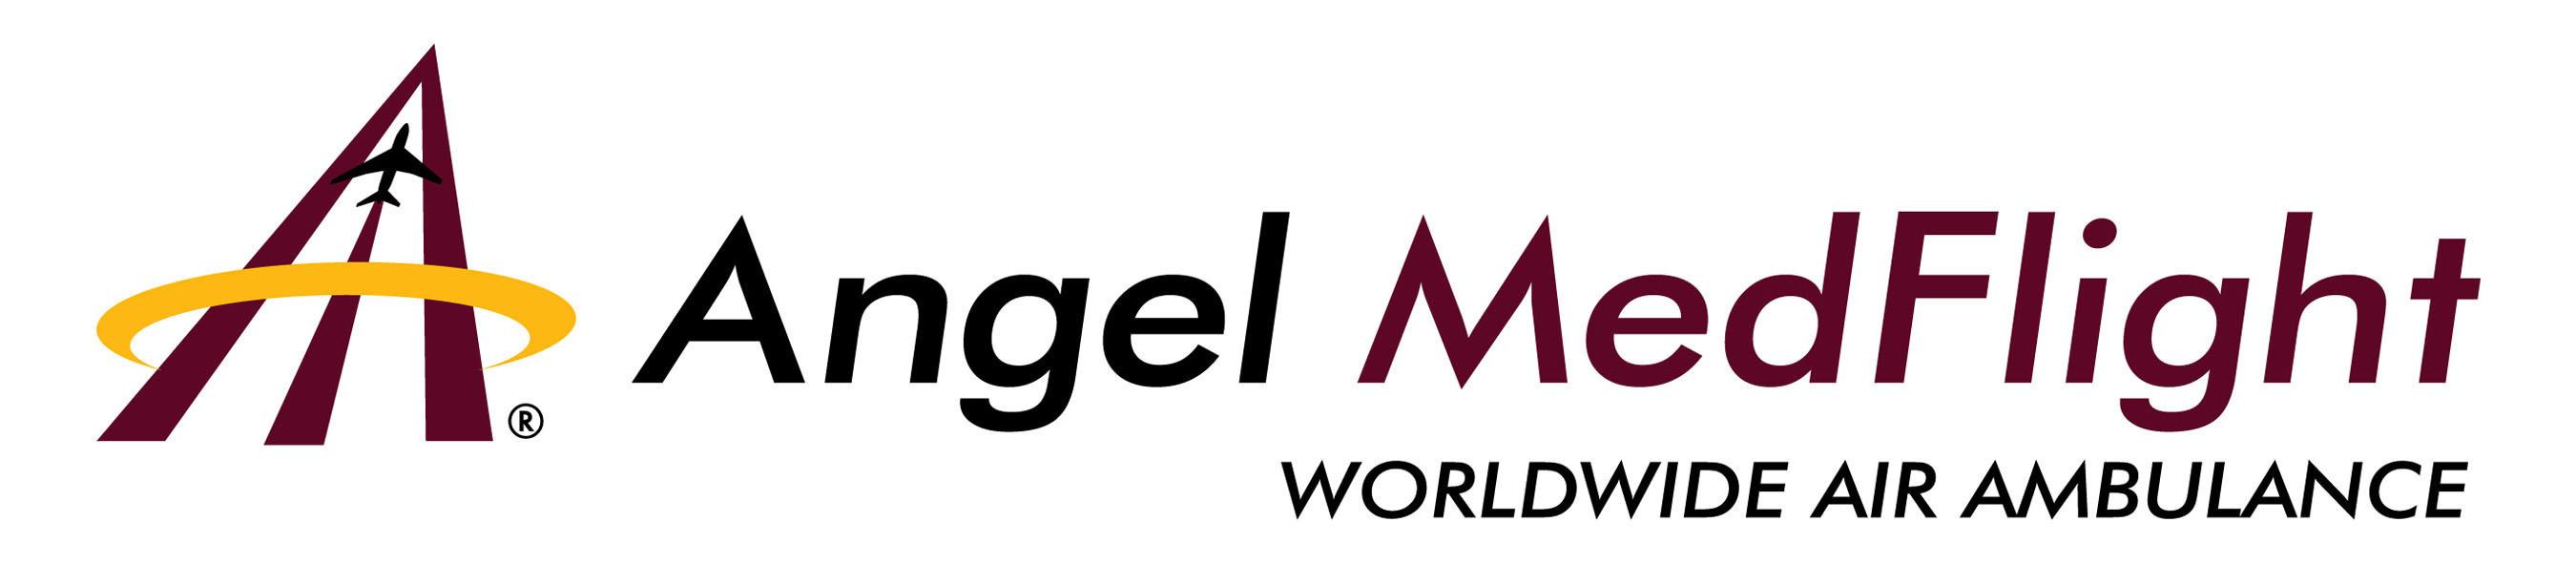 Angel MedFlight Worldwide Air Ambulance.